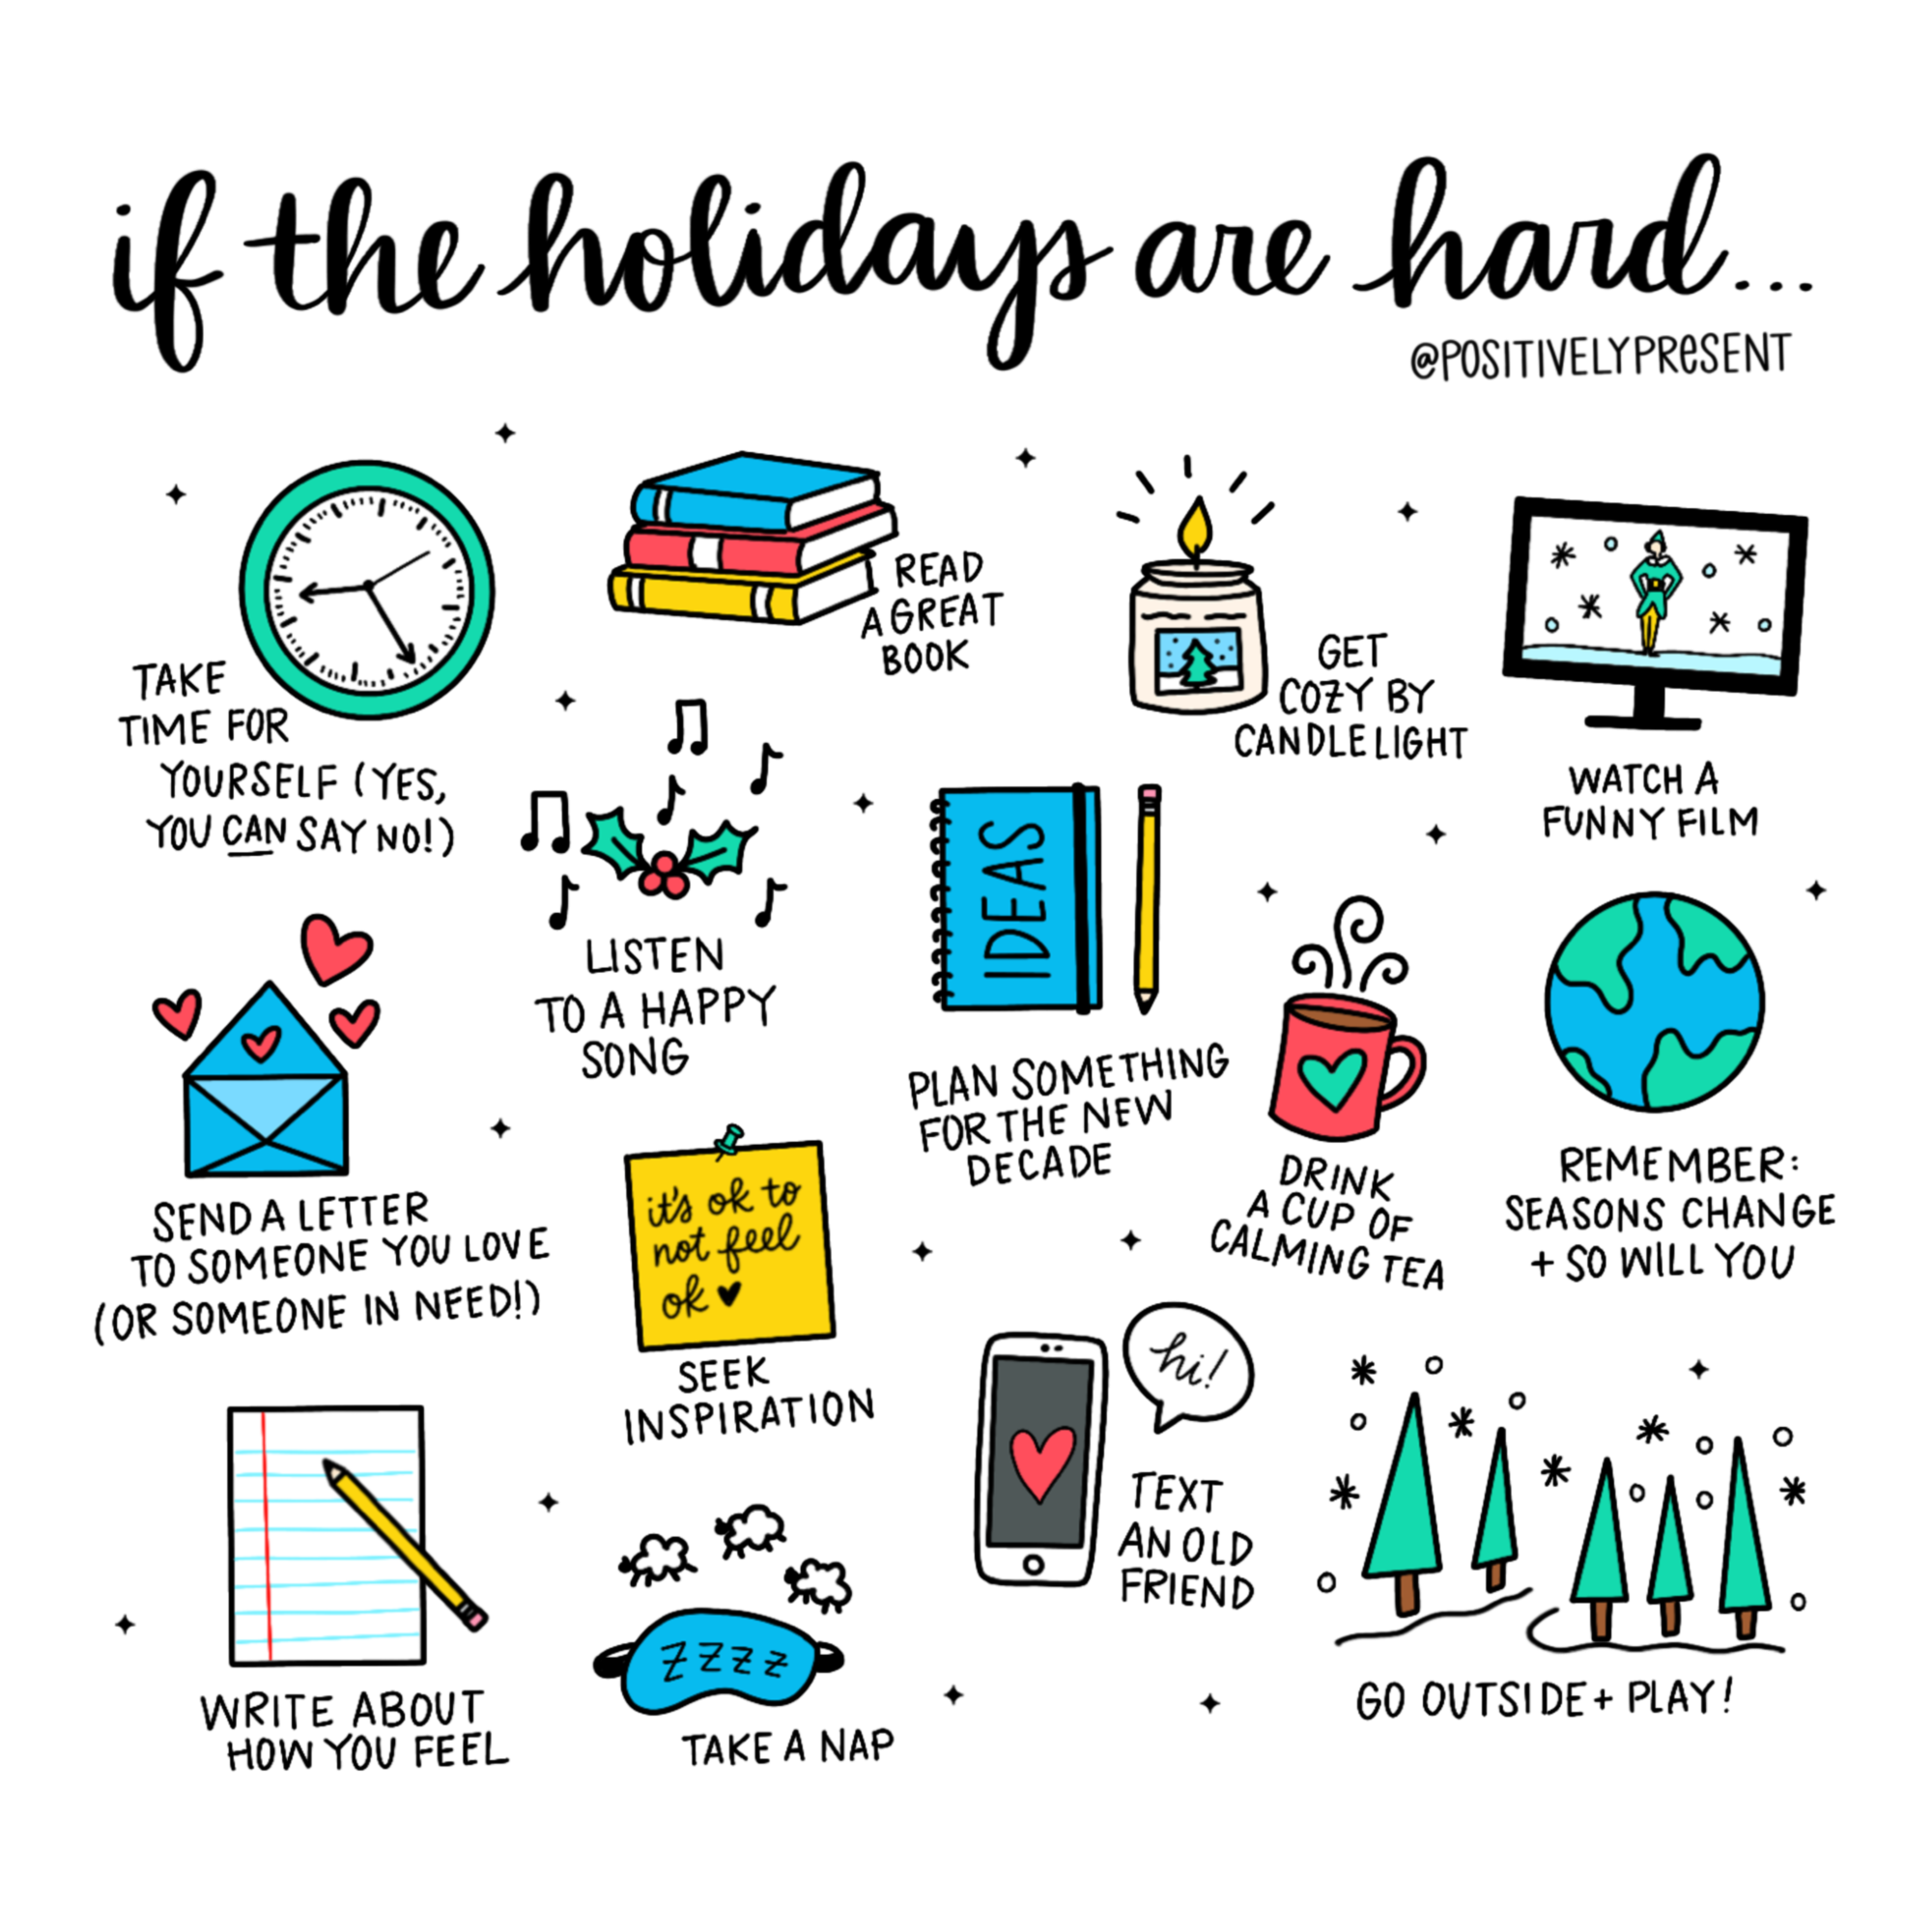 holidays are hard